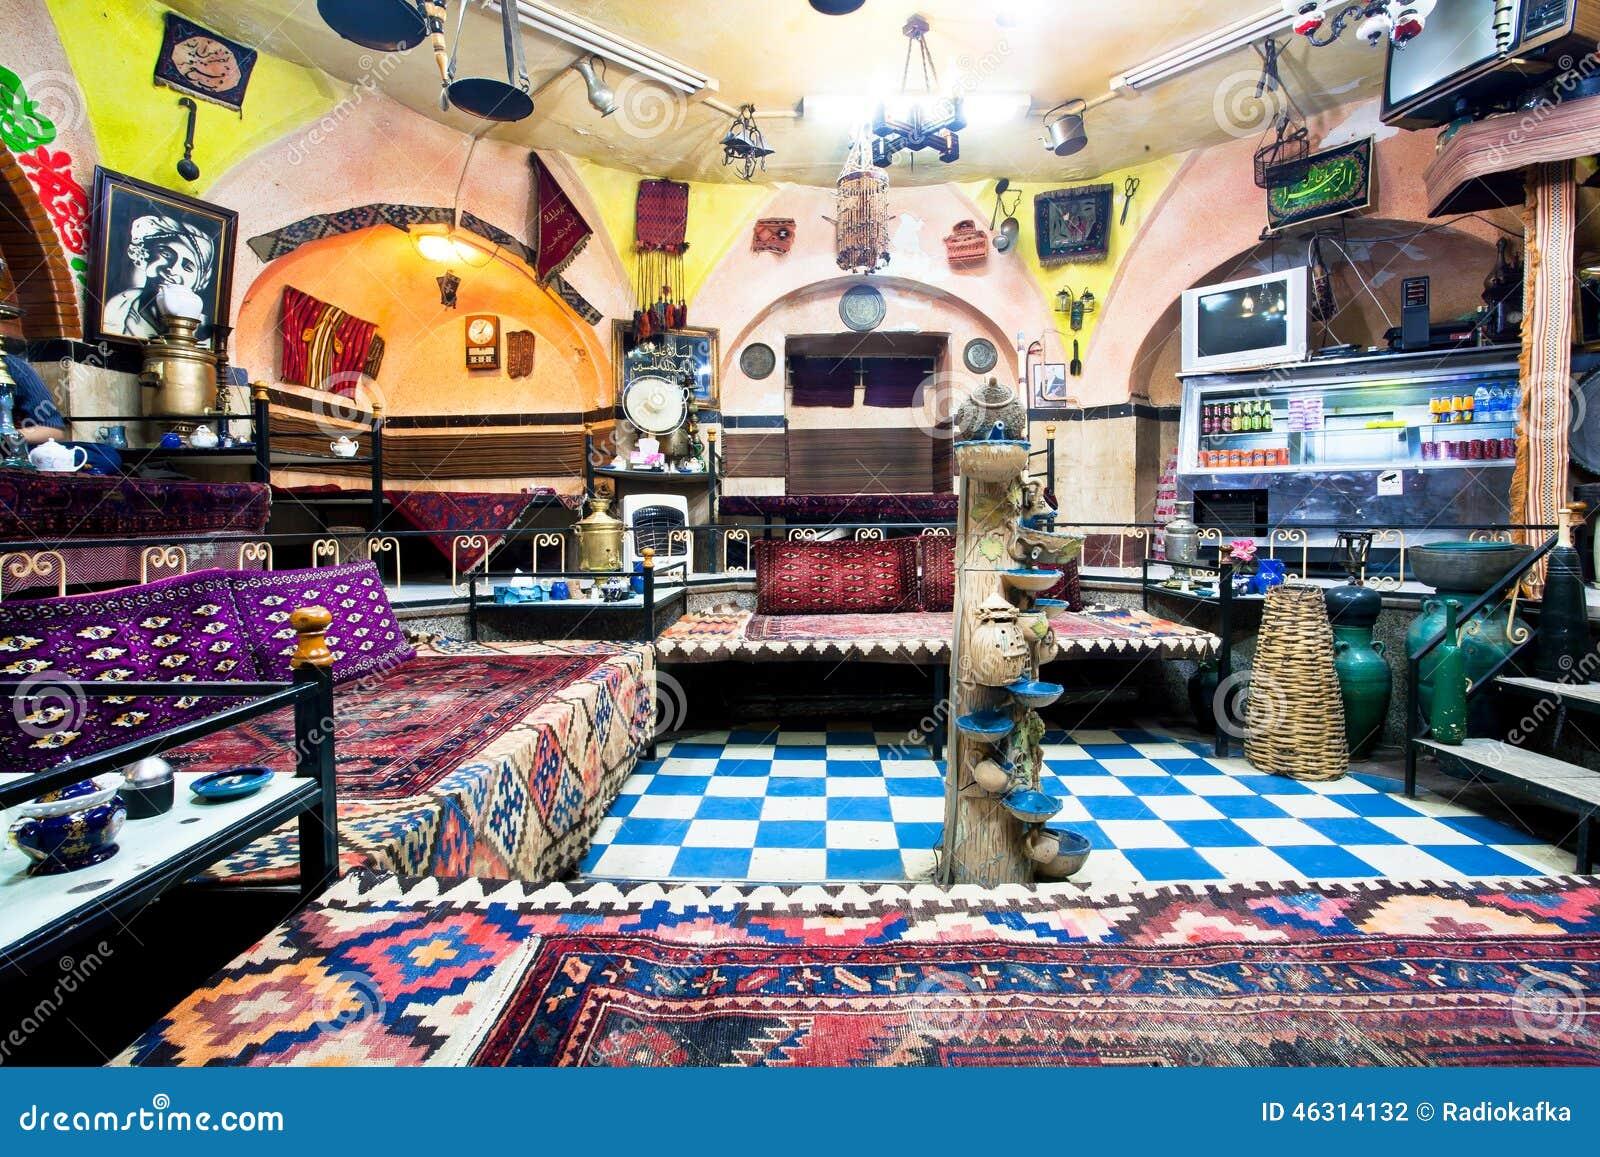 Iranian House Design